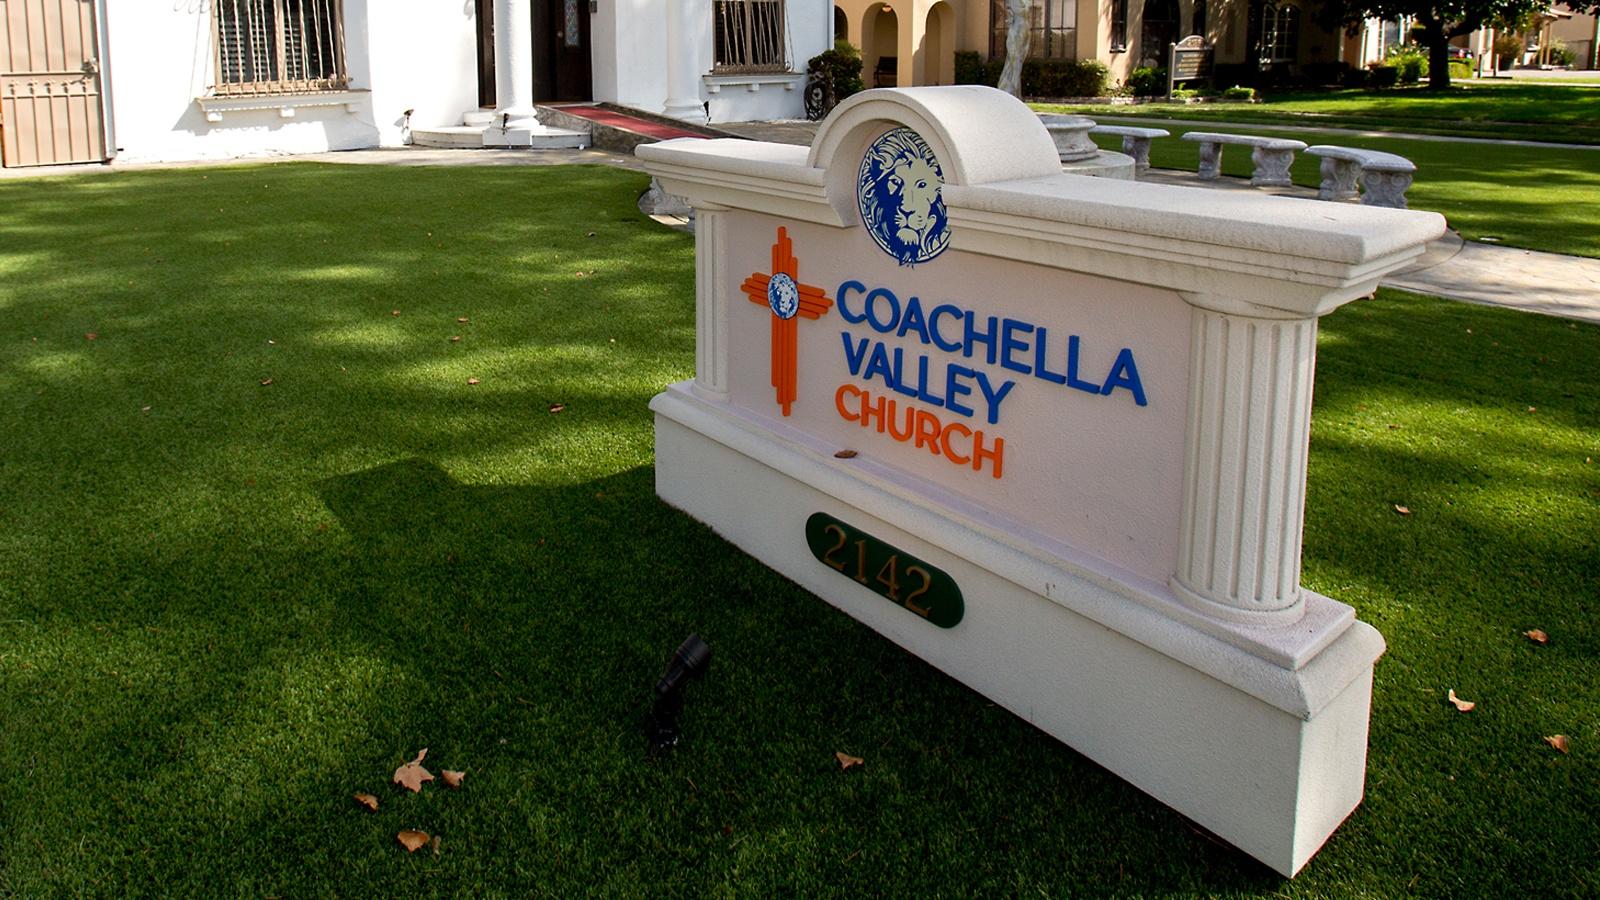 Coachella Valley Church.jpg